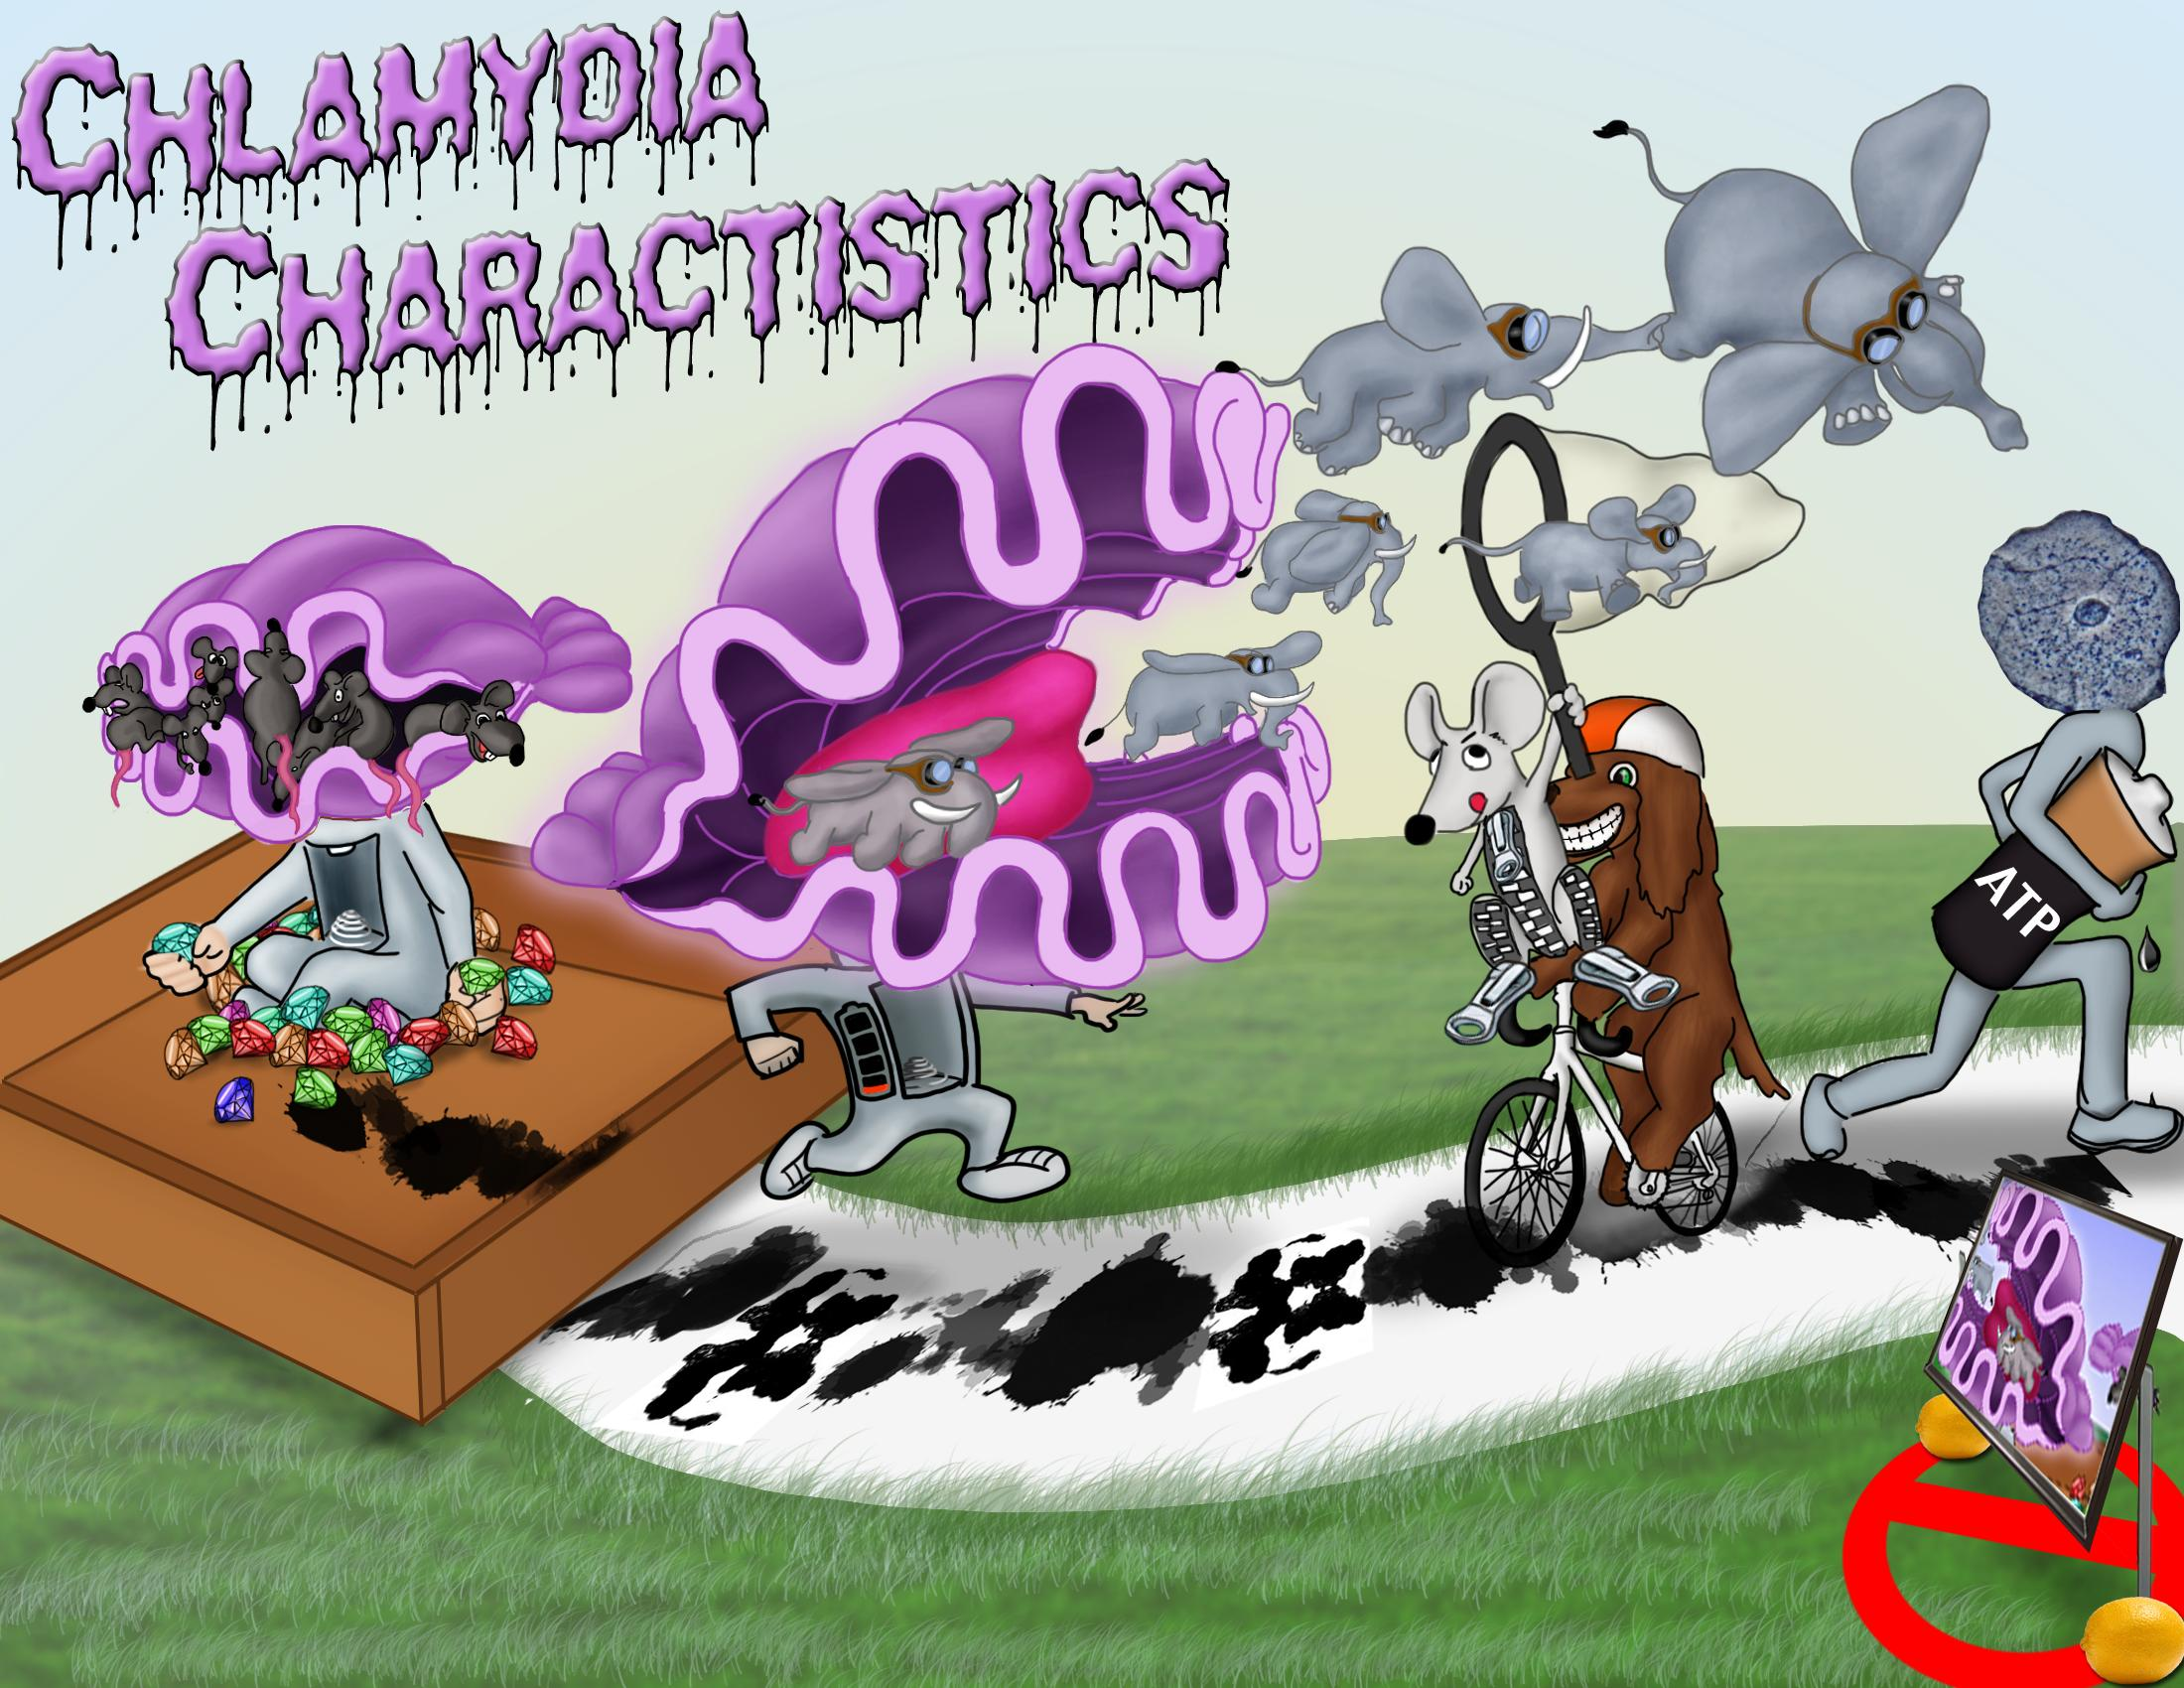 Chlamydia Characteristics